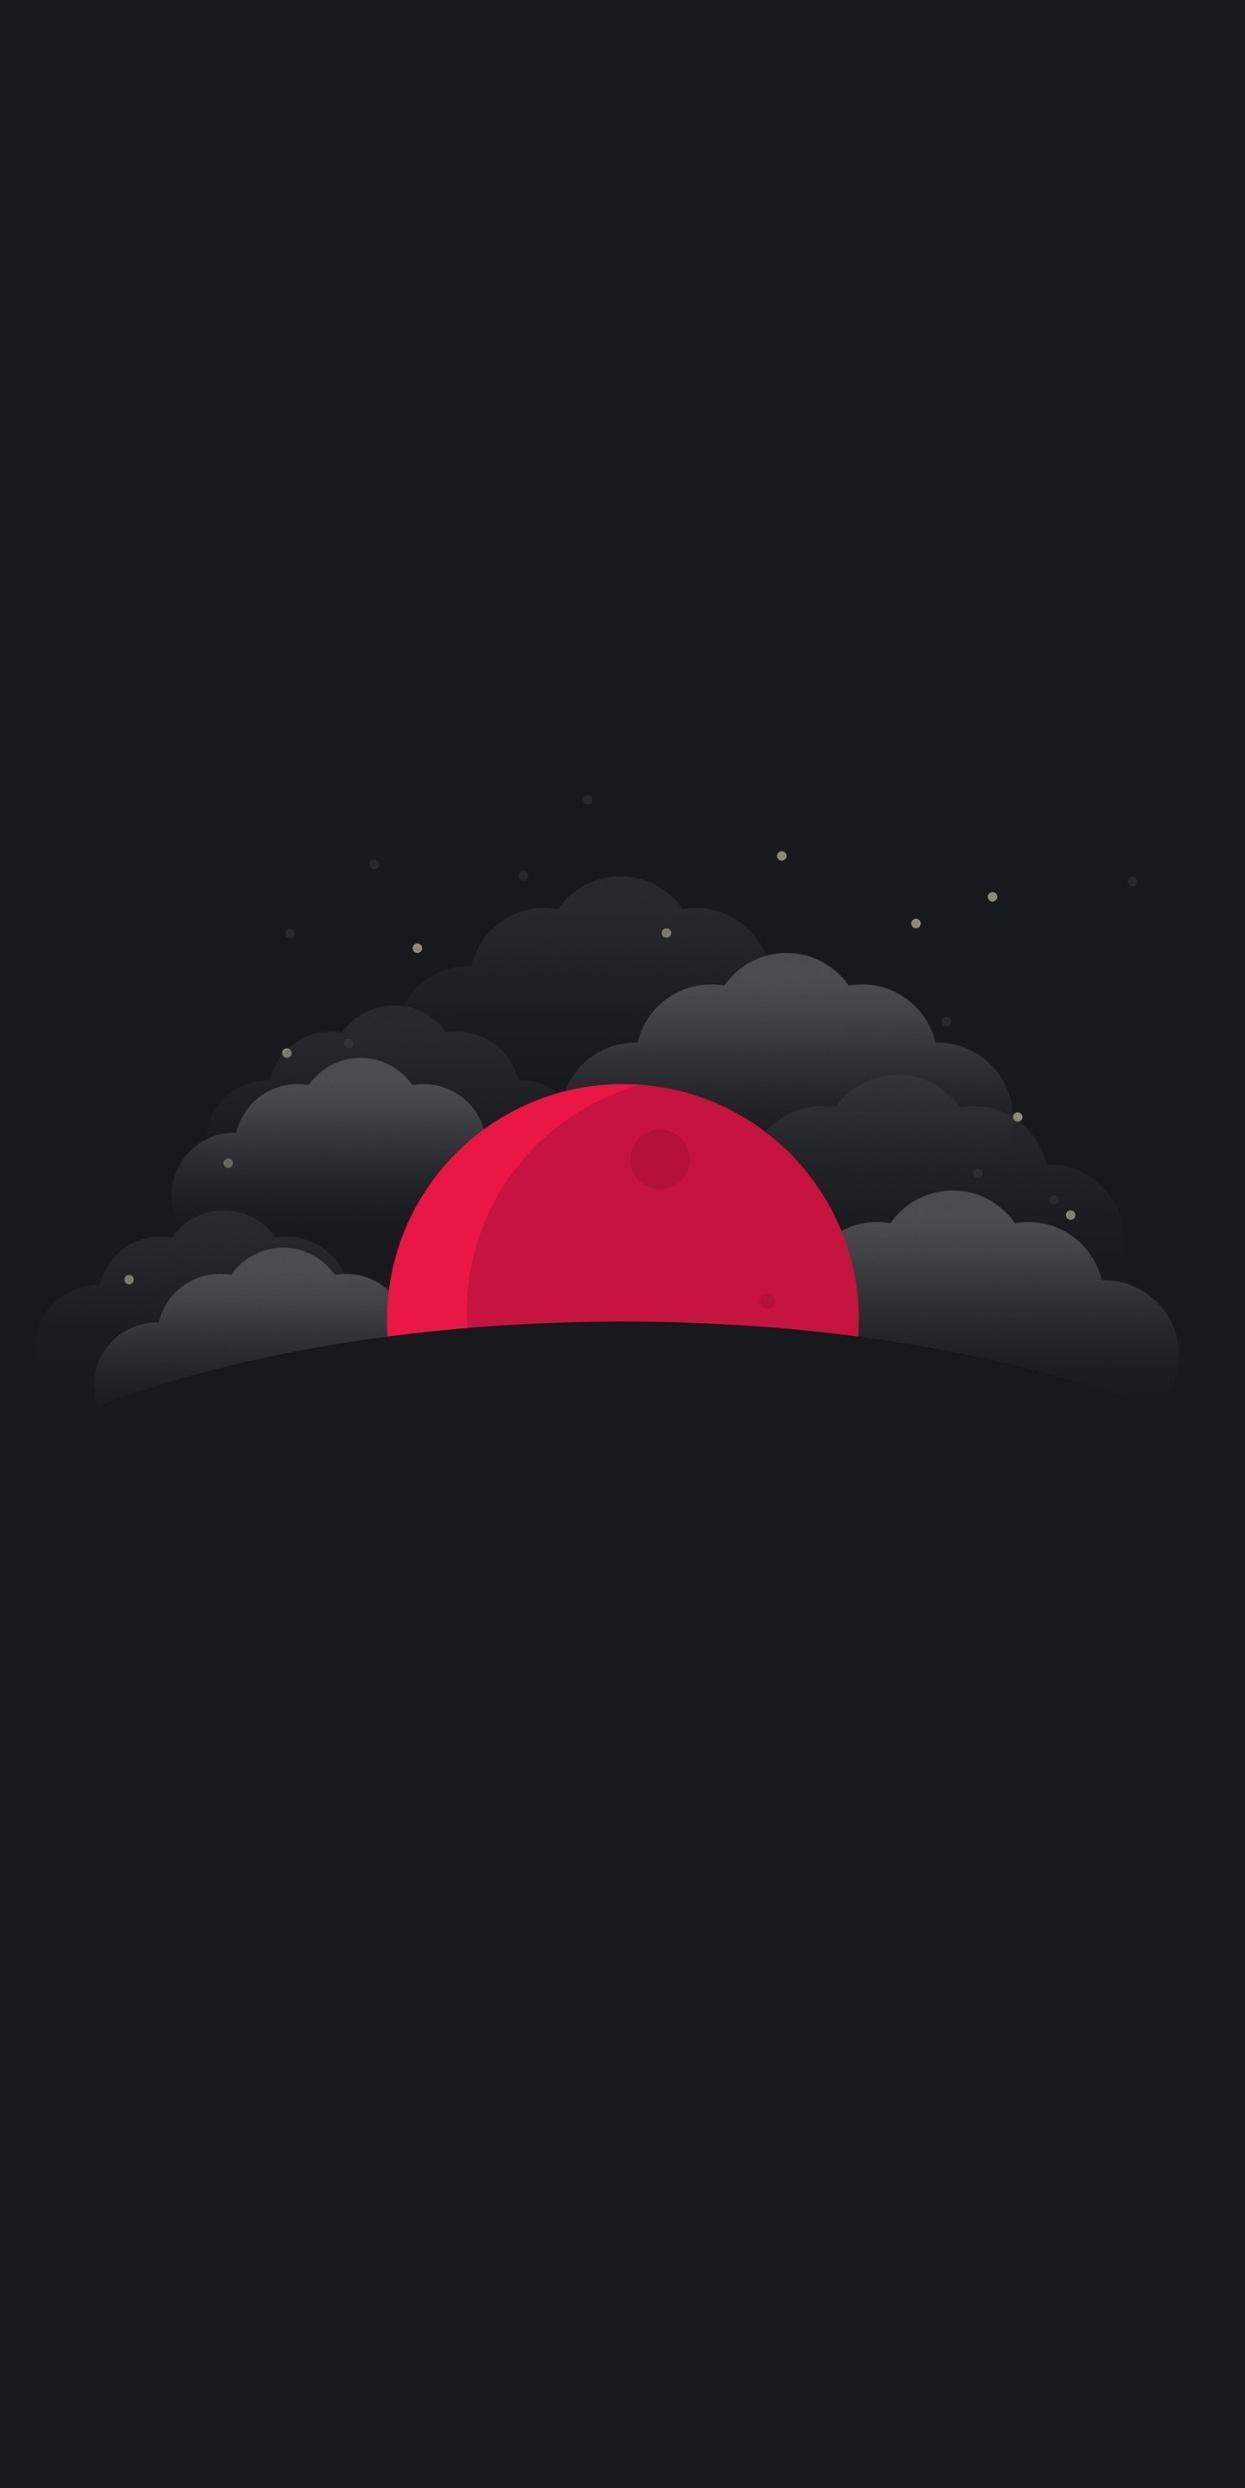 Moon Clouds iPhone Wallpaper